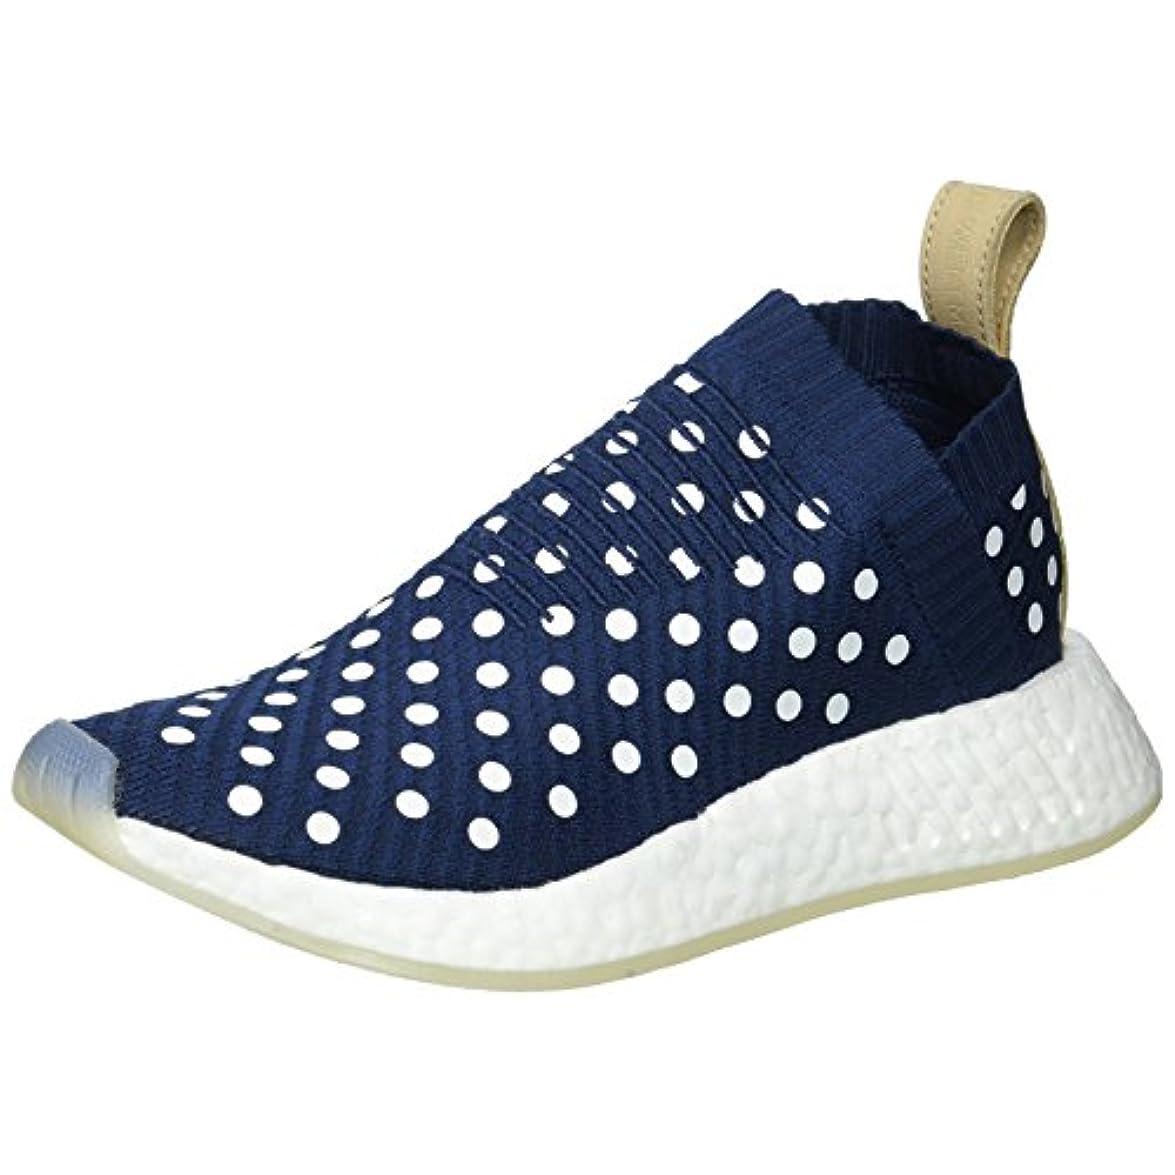 Adidas Nmd Cs2 Pk W 'ronin Pack' - Ba7212 Size 9 5-us amp; 42-eu